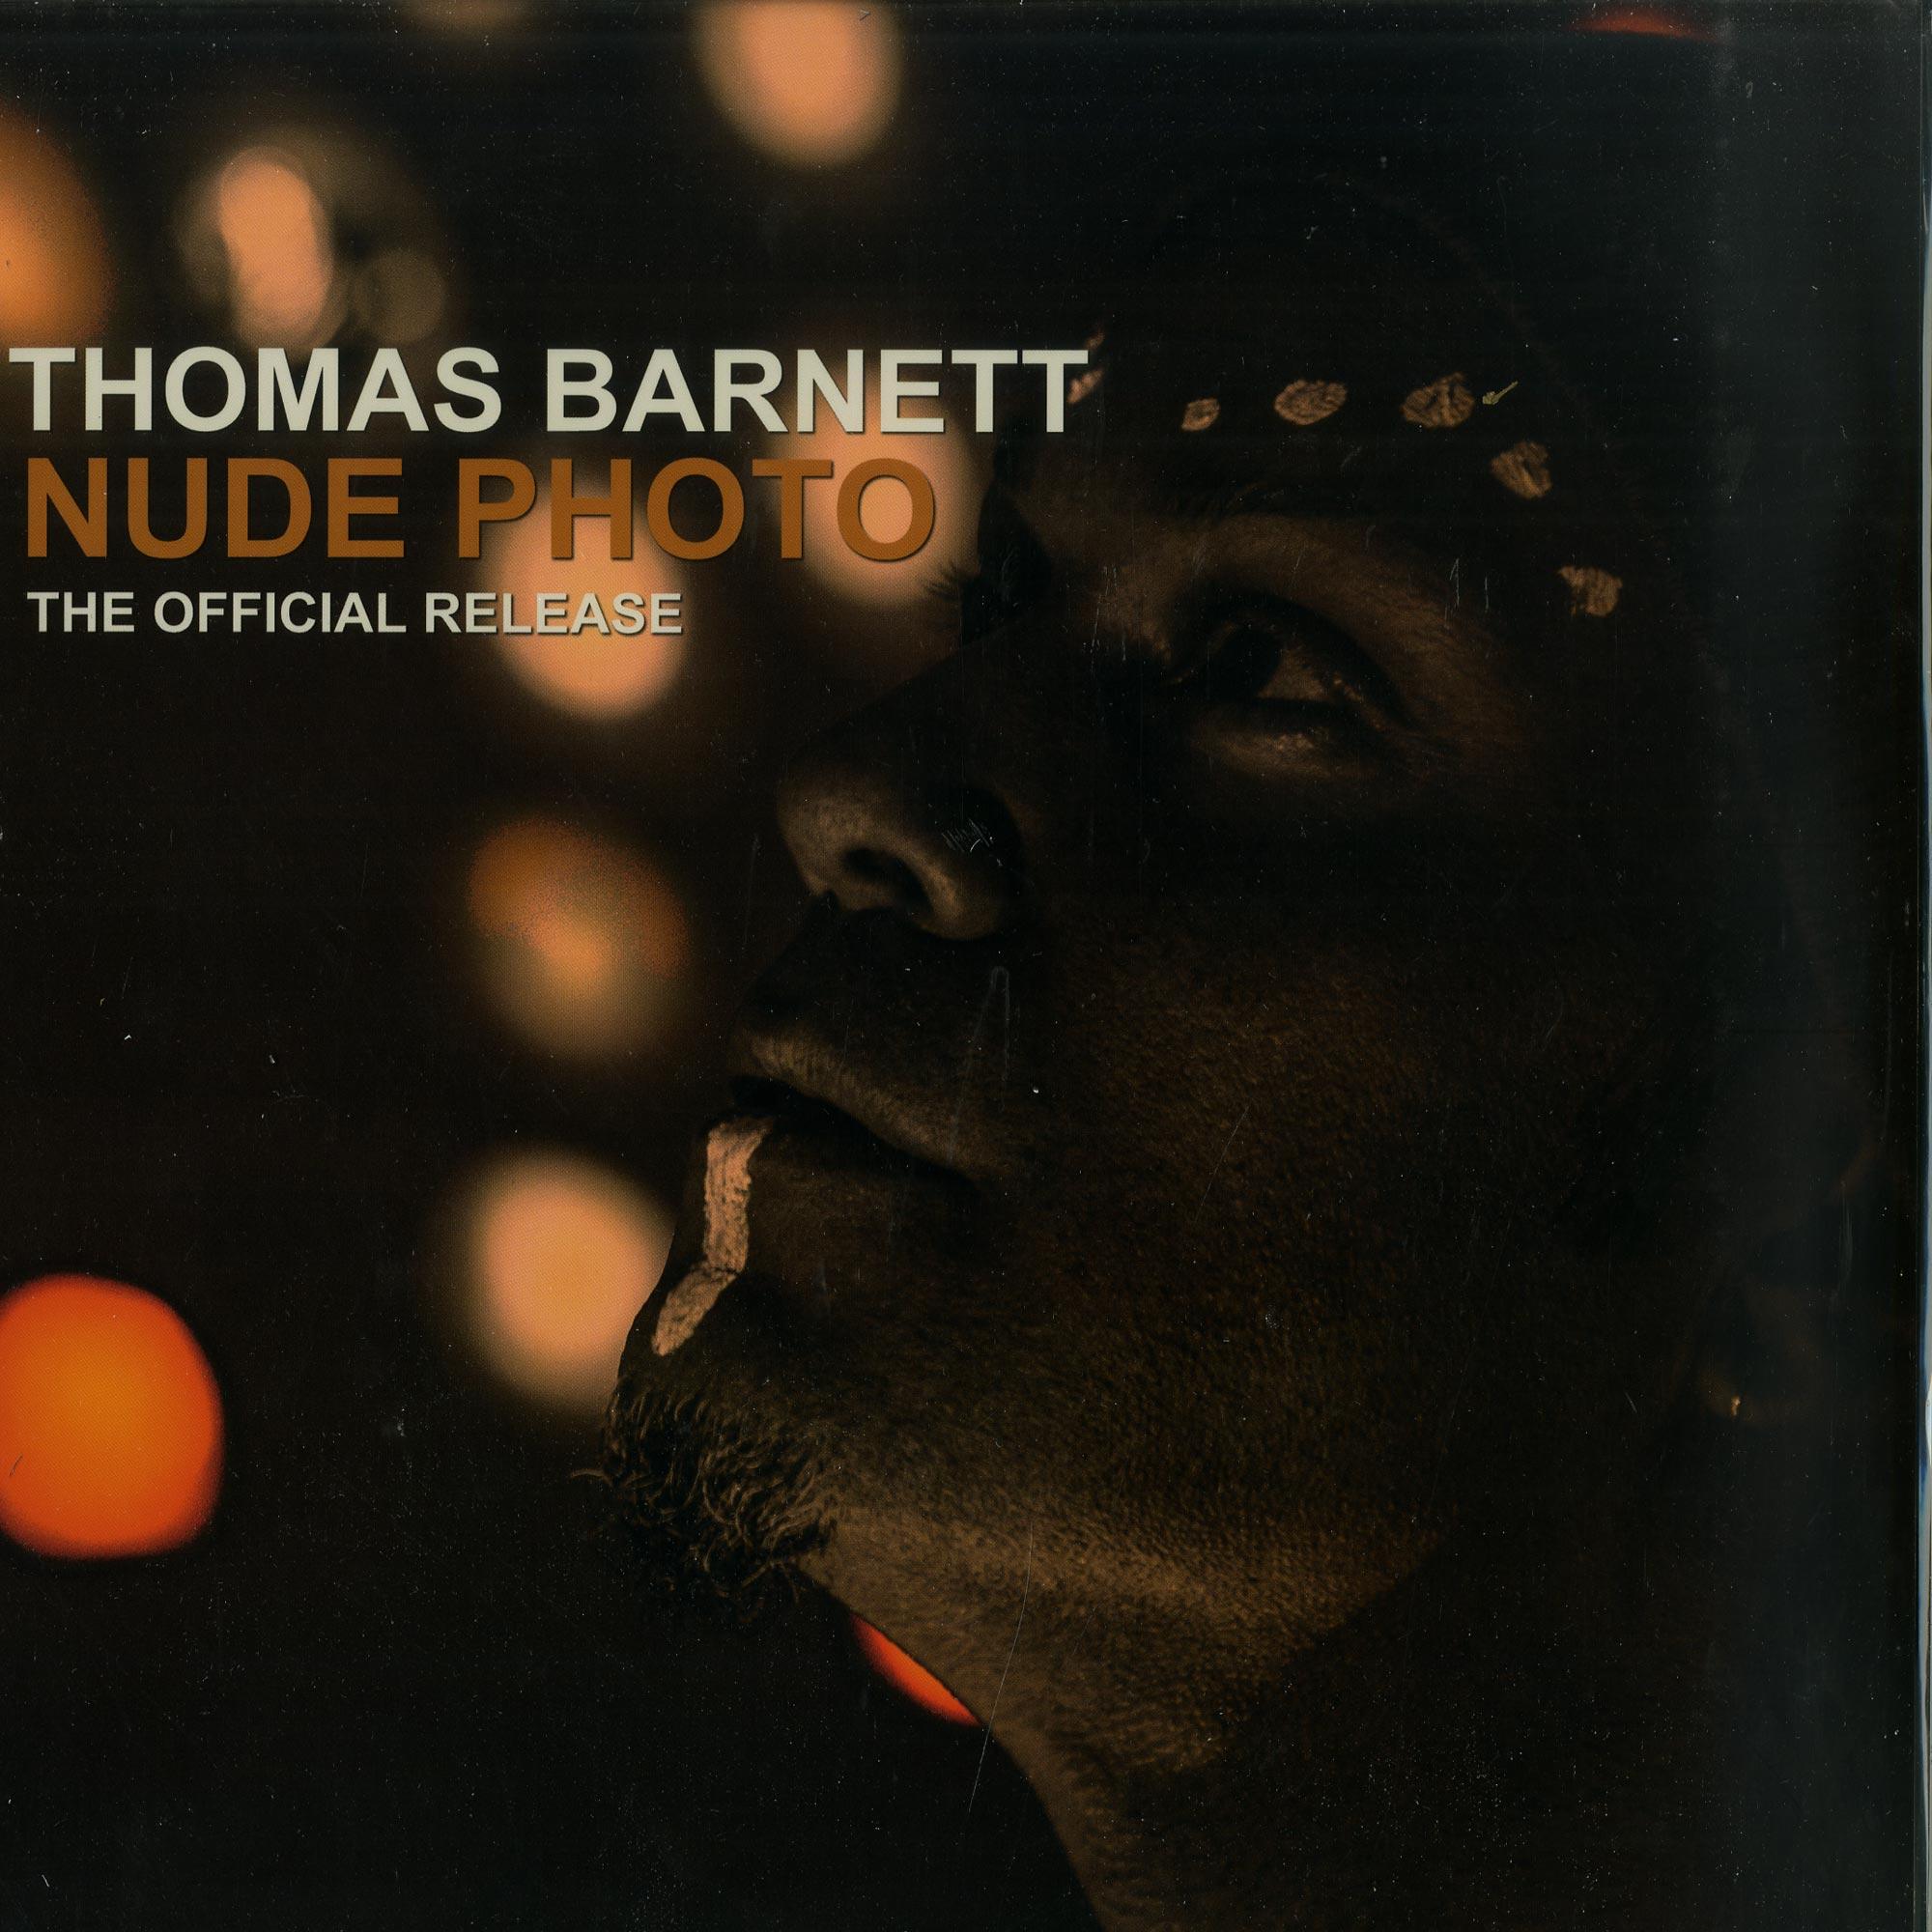 Thomas Barnett - NUDE PHOTO